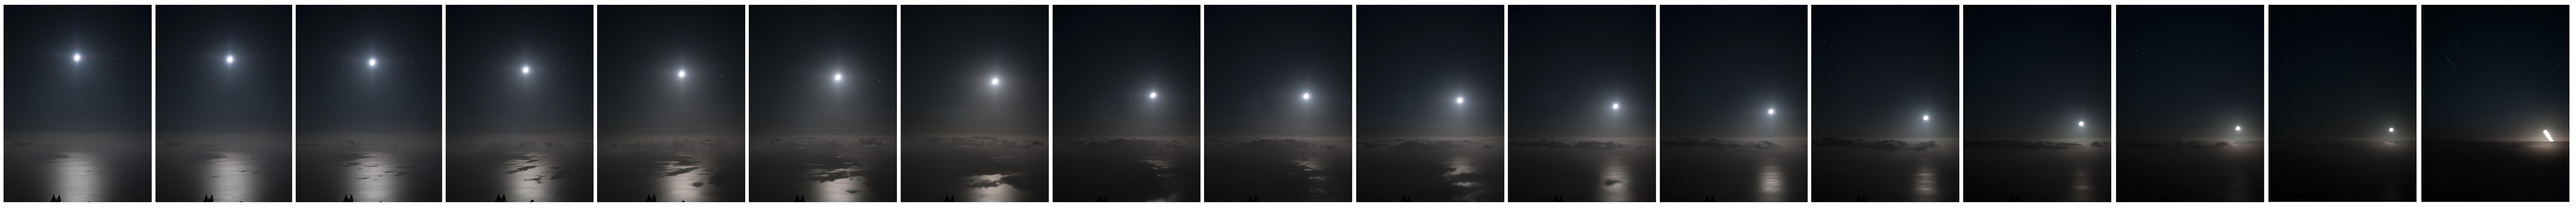 . Moonset